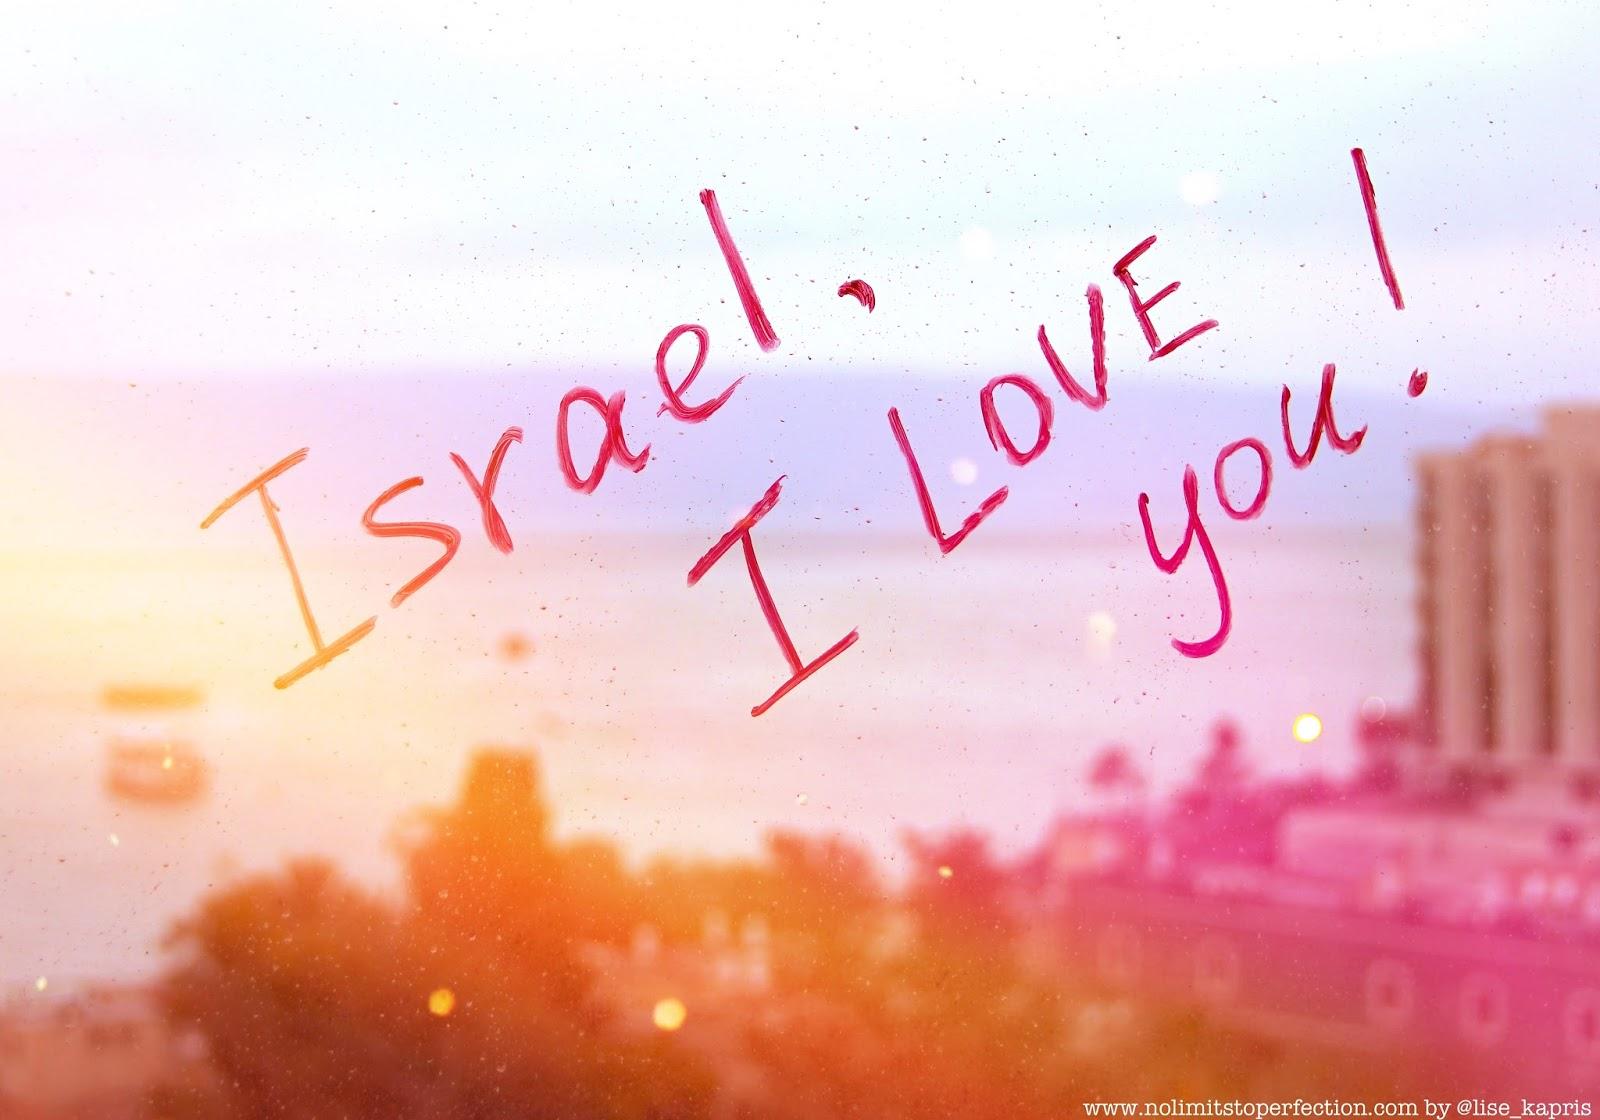 Lise Kapris about Israel